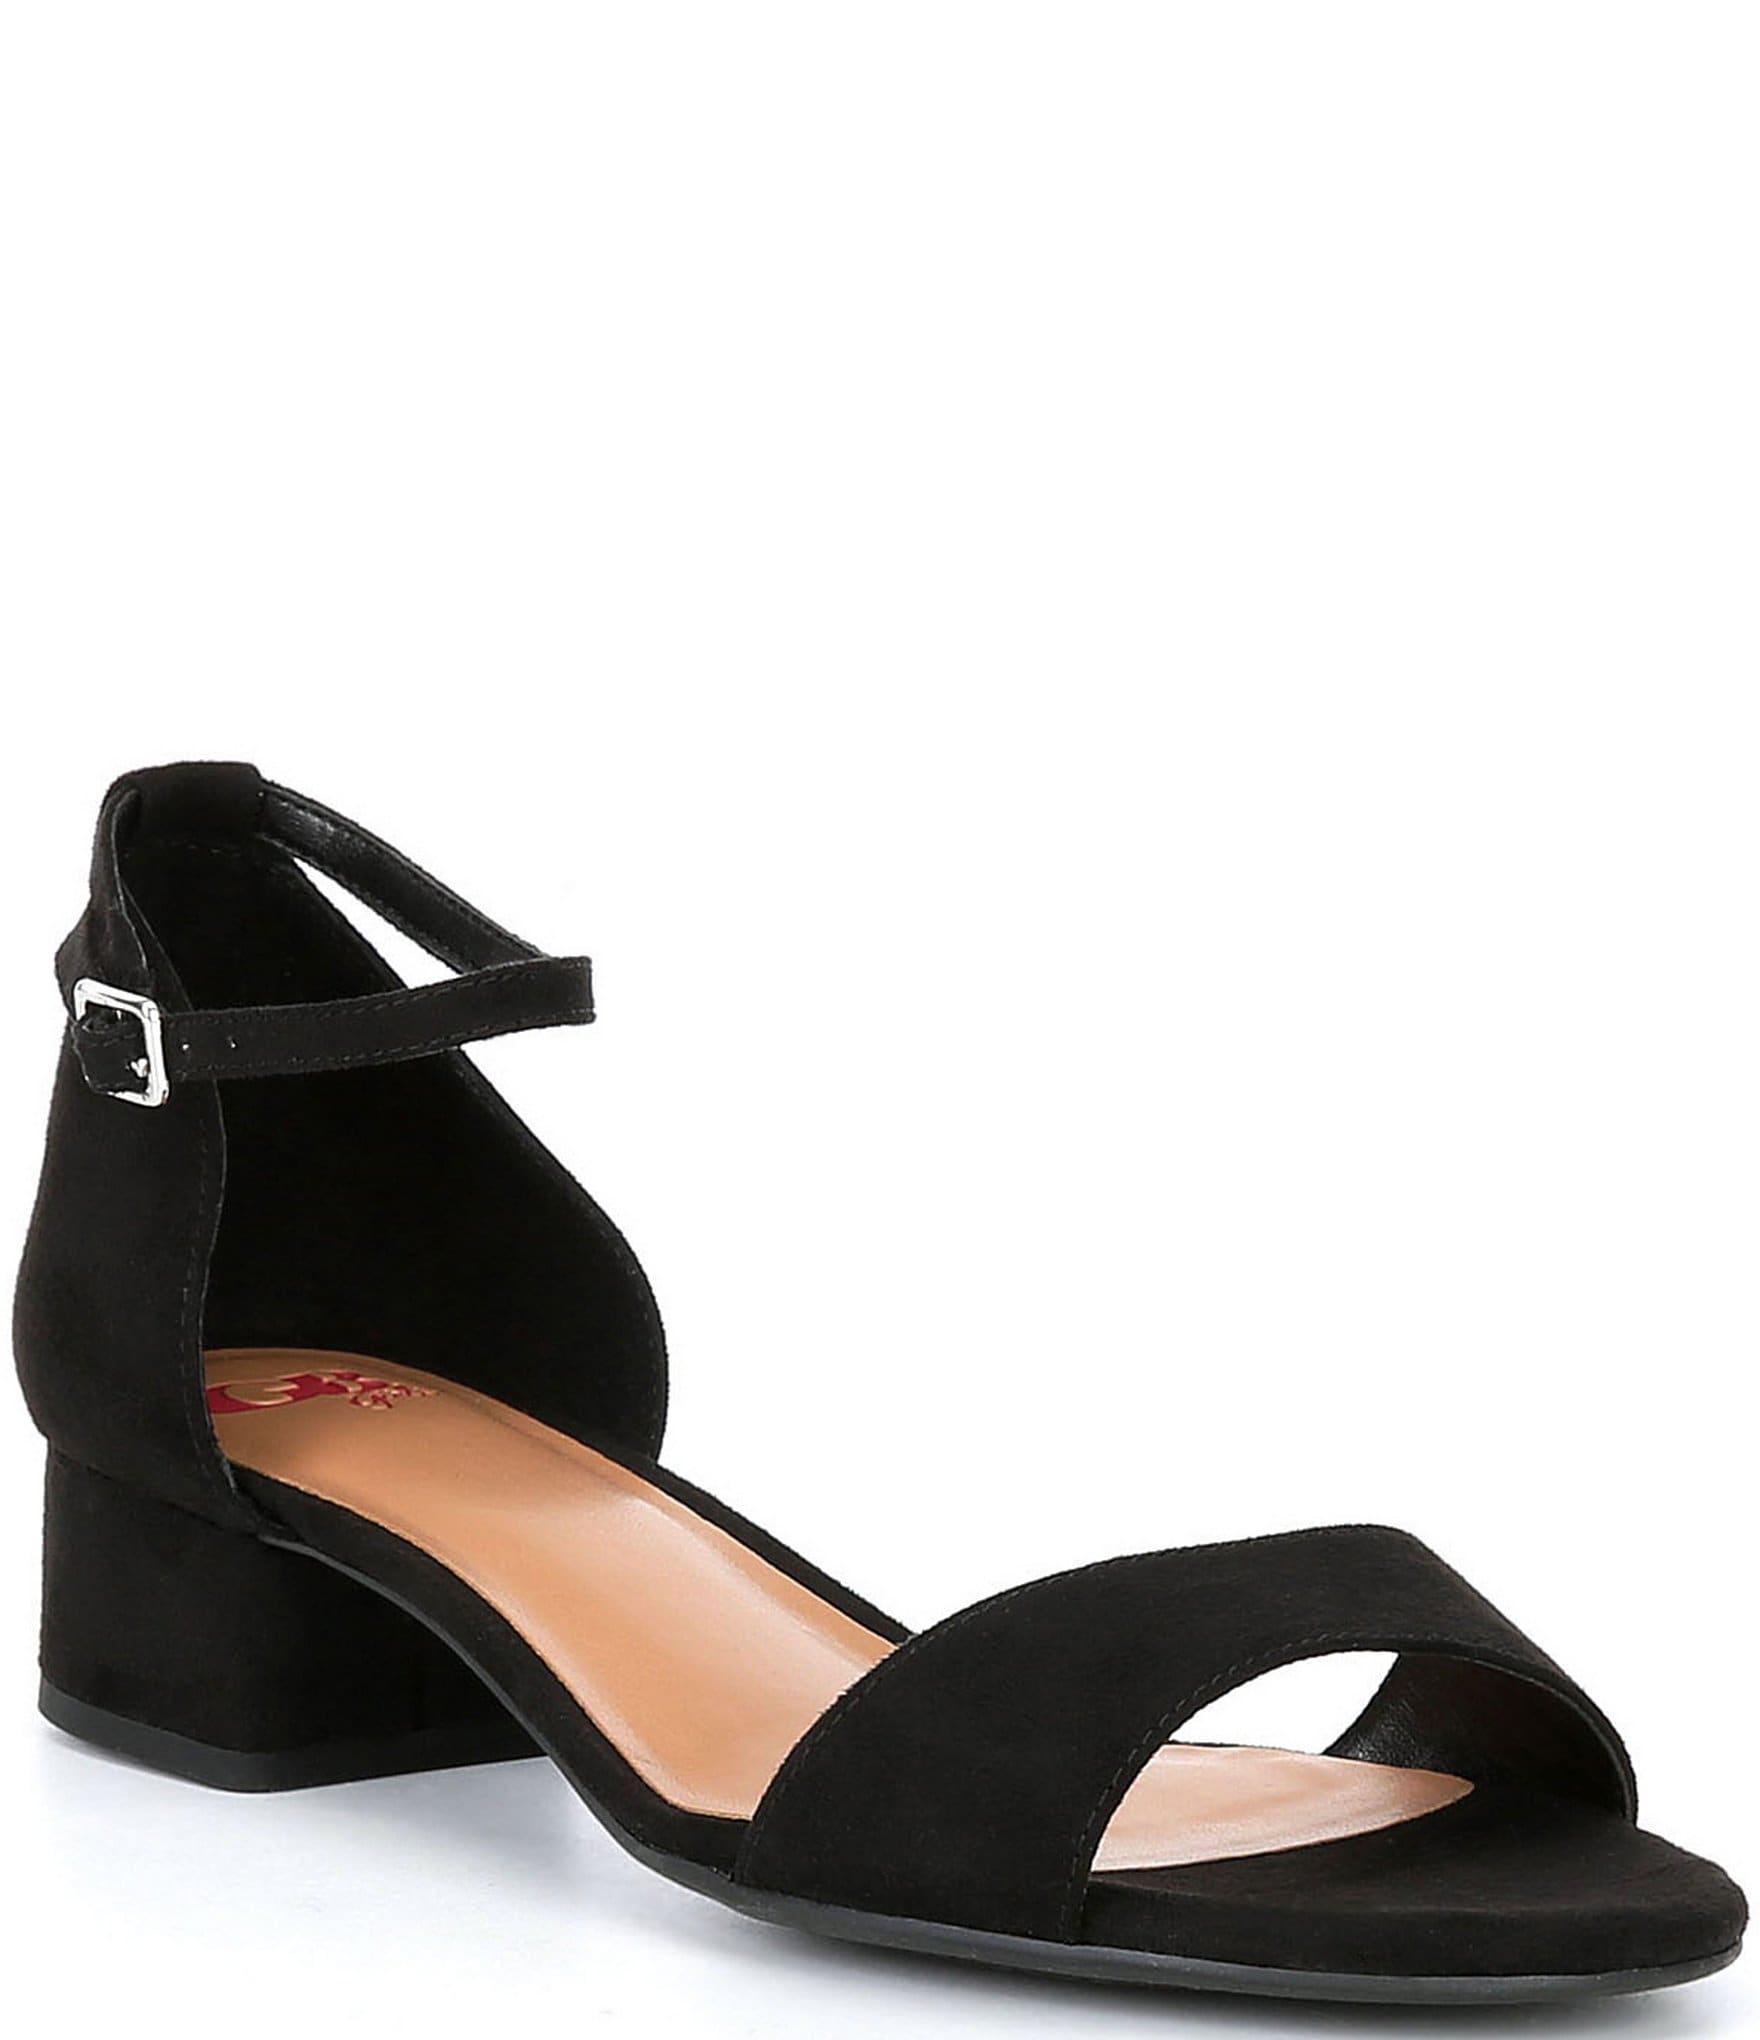 gb girls blockgirl anklestrap blockheel dress sandals